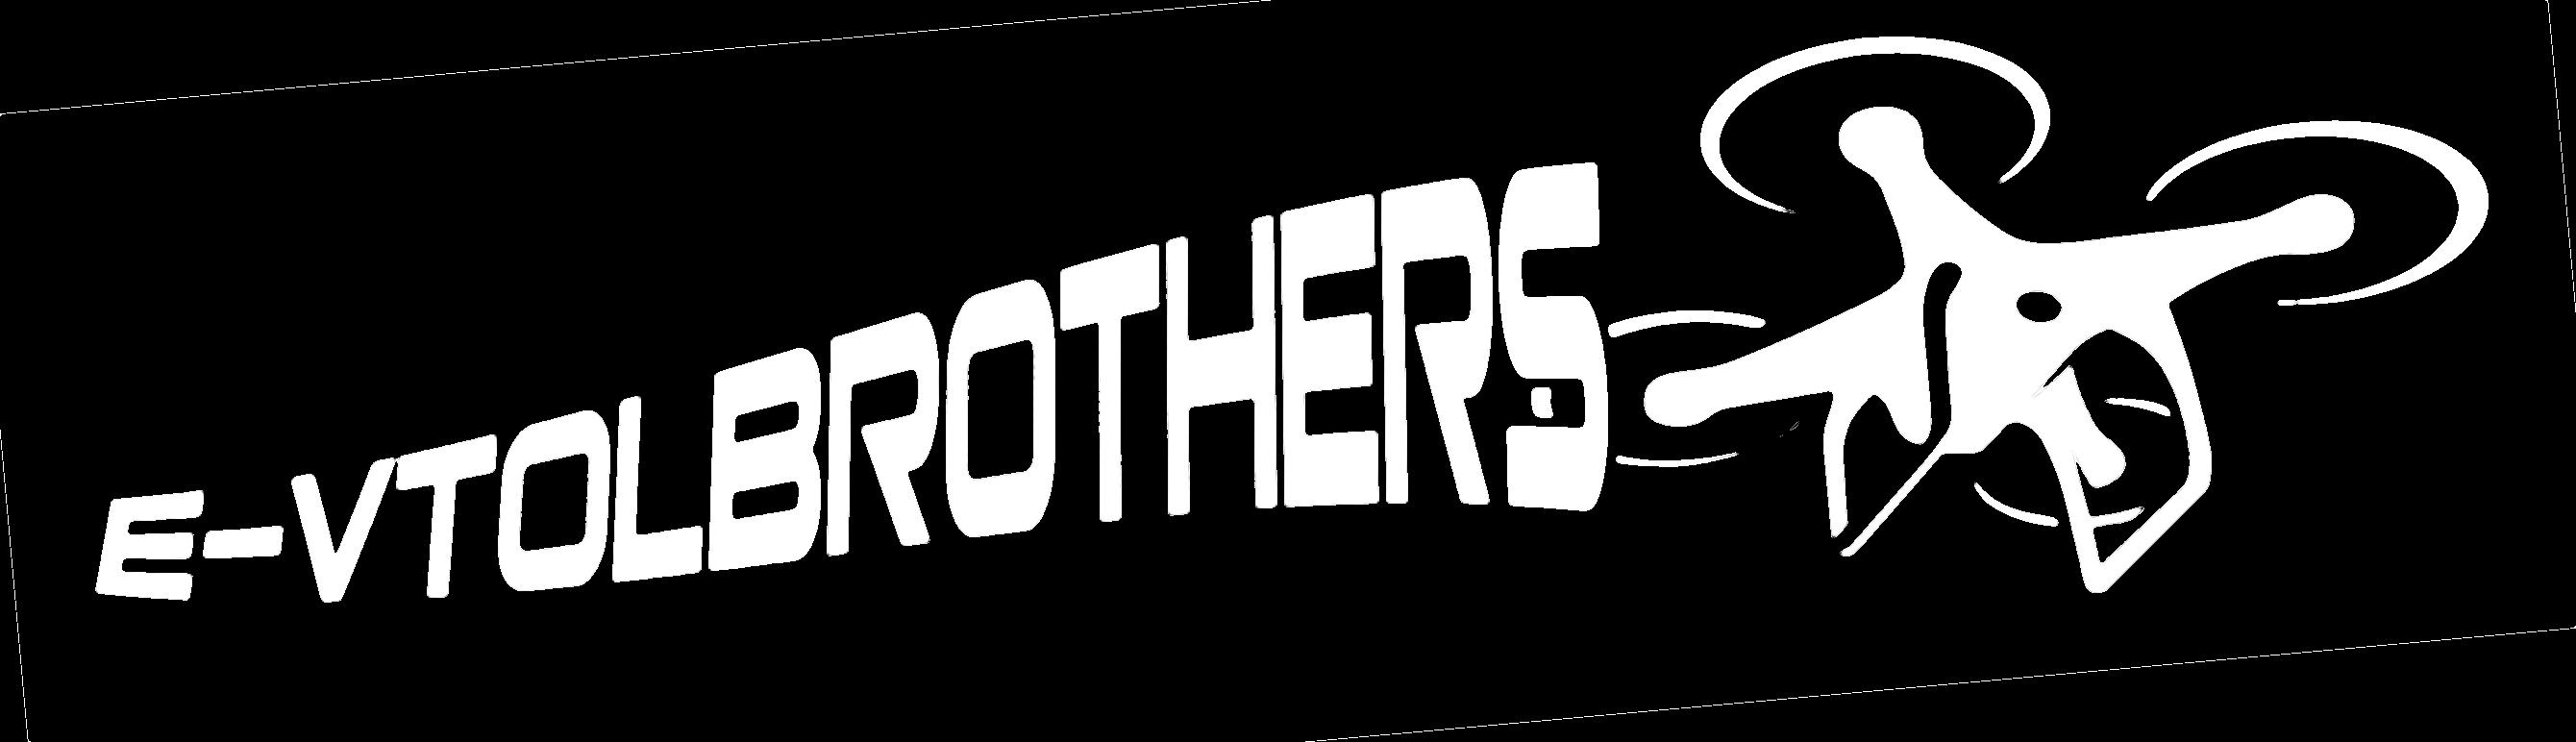 logo_evtb_white